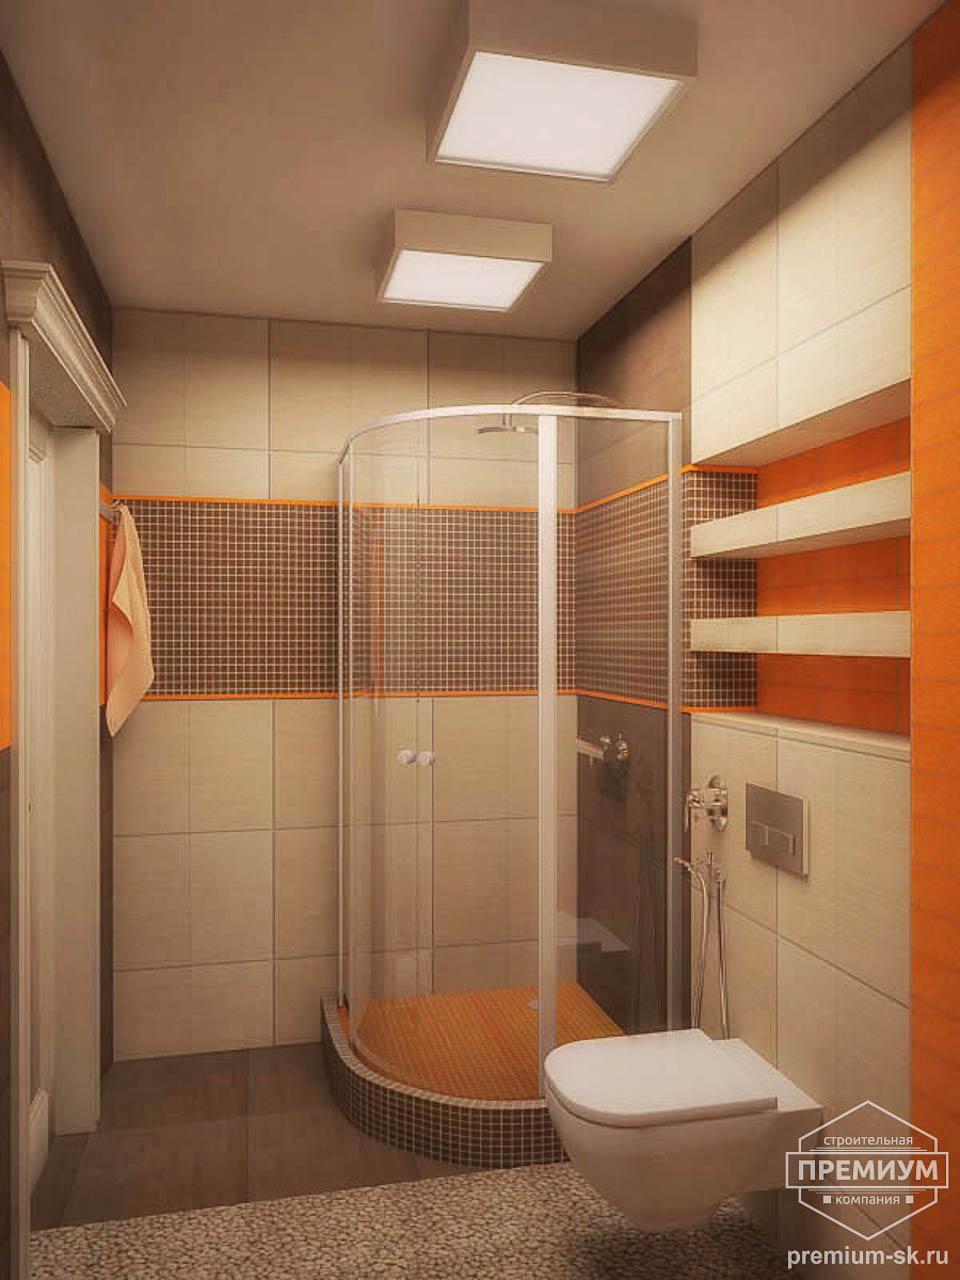 Дизайн интерьера однокомнатной квартиры по ул. Сыромолотова 11 img329504954